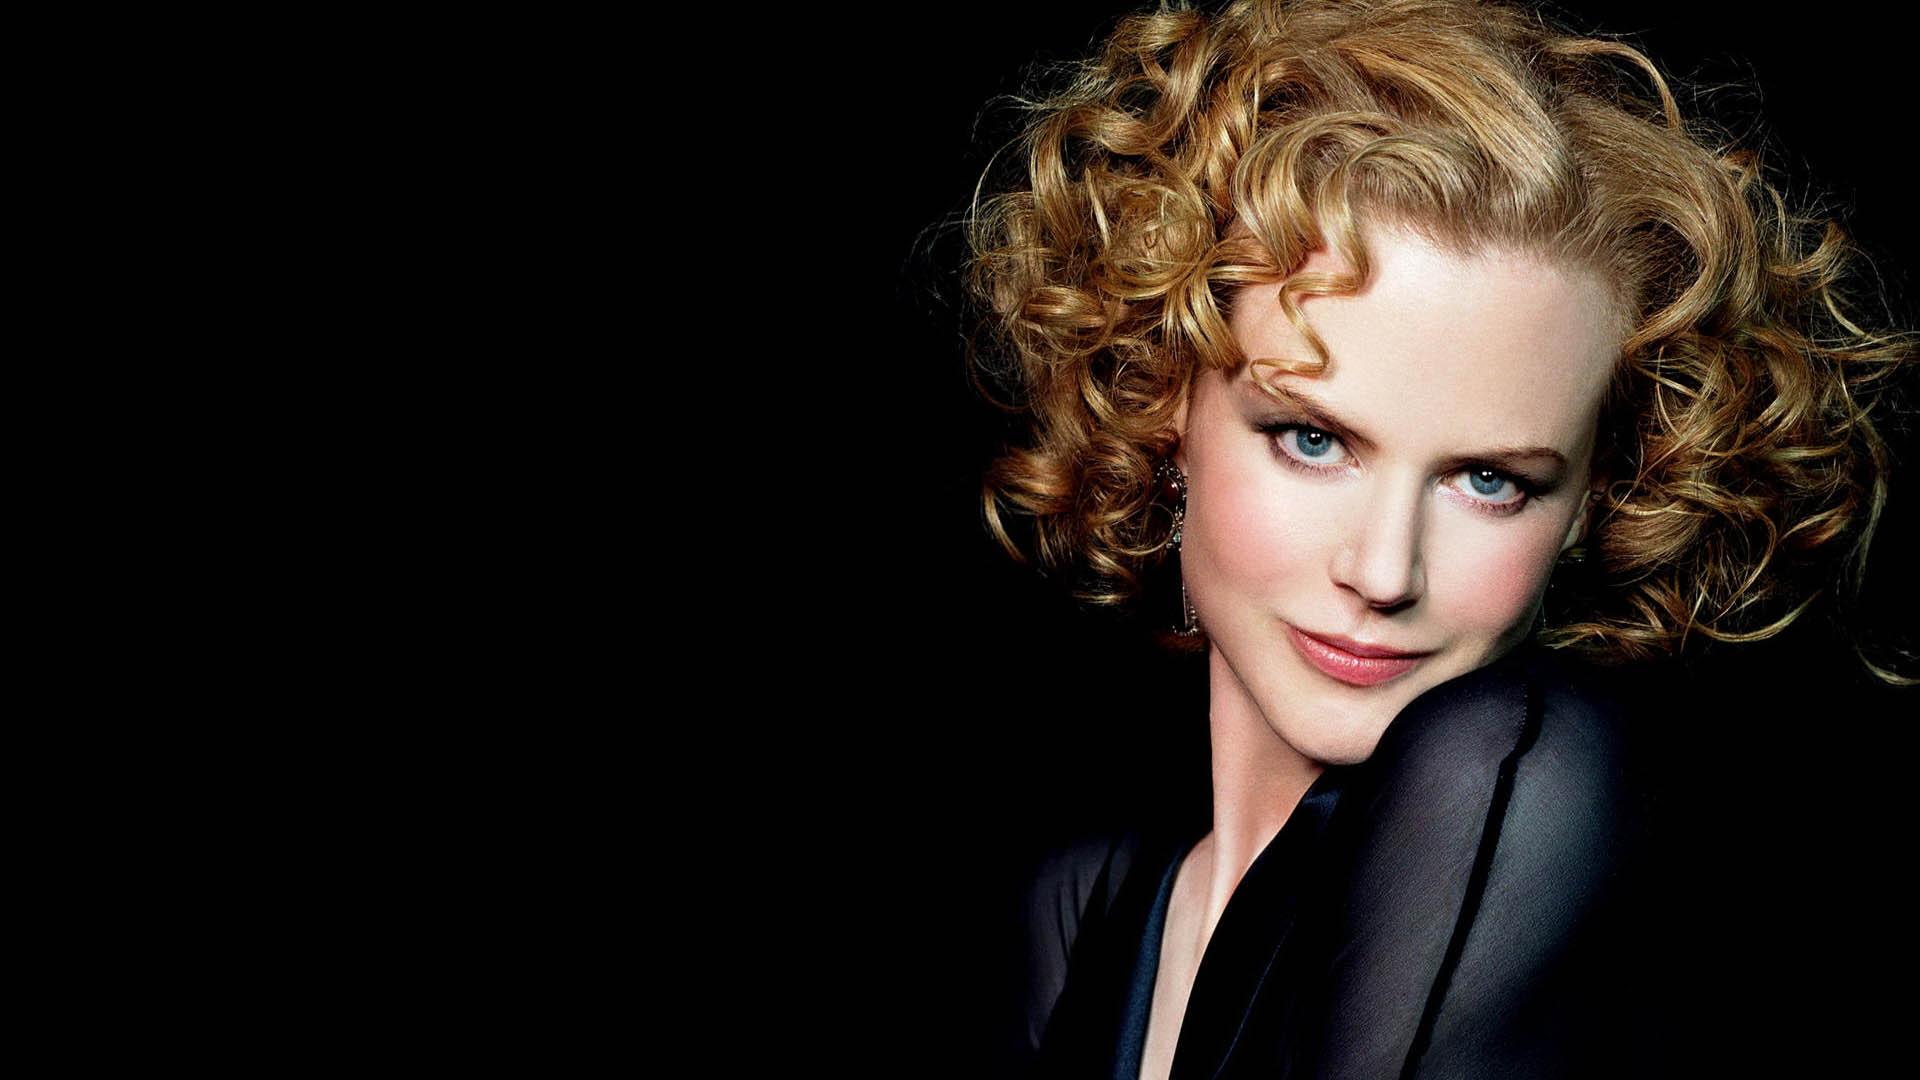 Nicole_Kidman_Wallpapers_HD_-_1920x1080_-_0017